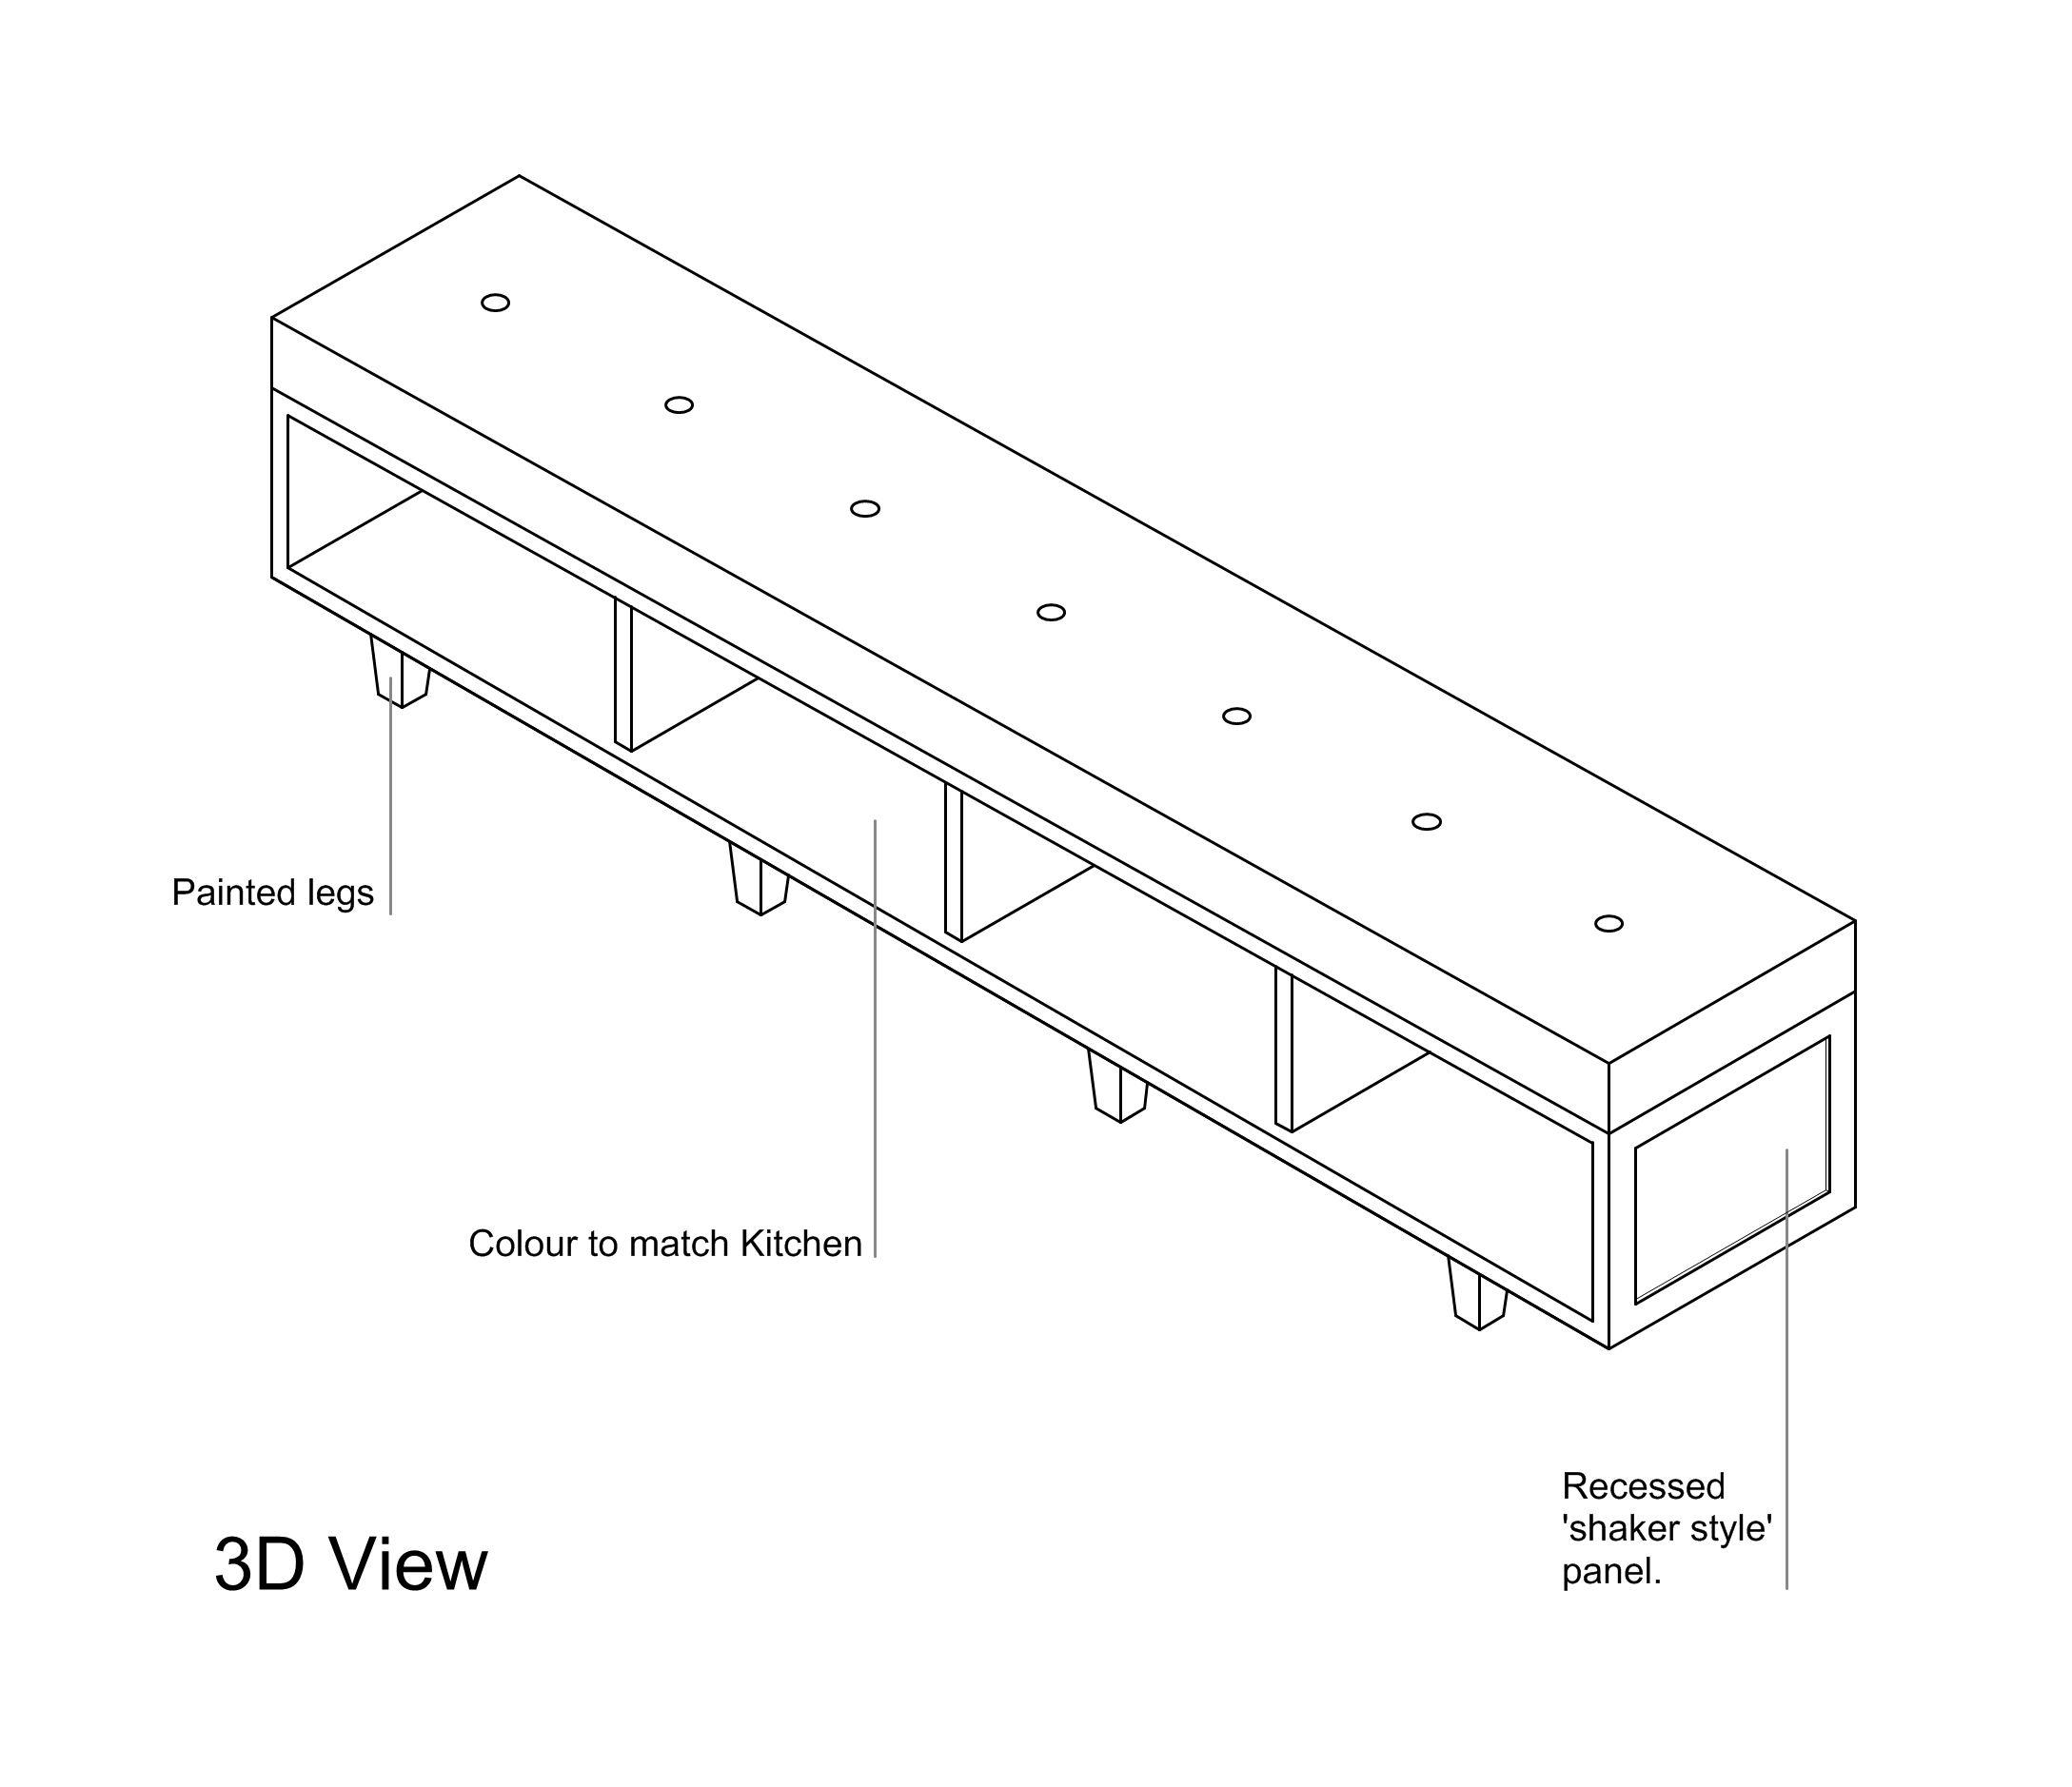 furniture detail drawings  u00bb kent griffiths design